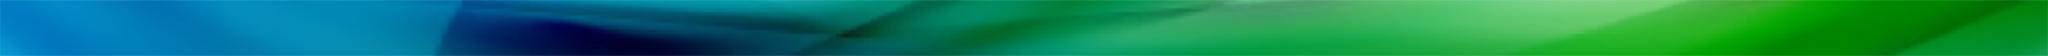 ISMCOE-1-swooshbar.png